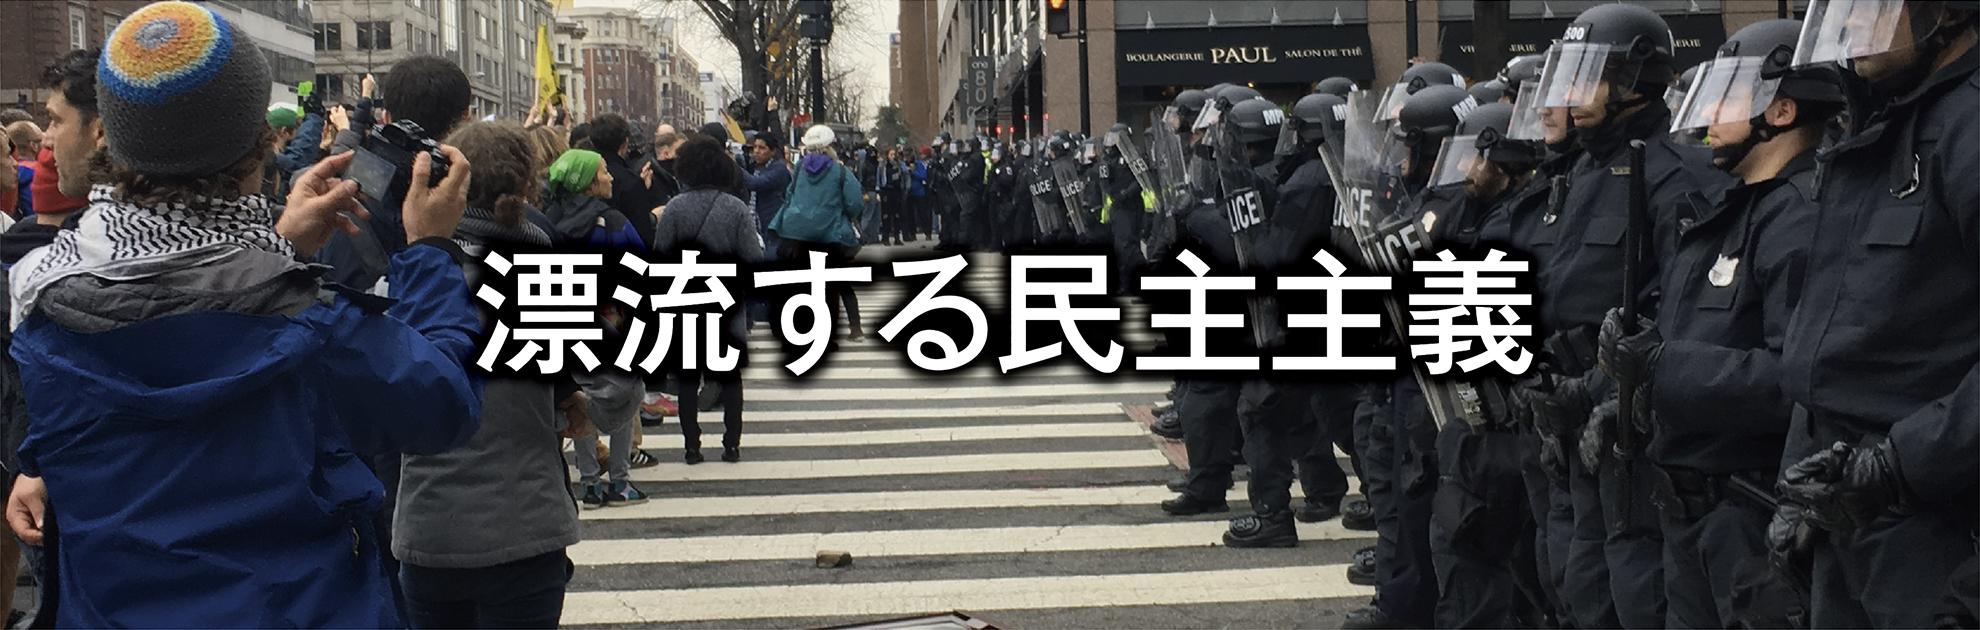 2018/12/14 Fri. 真鍋弘樹×上岡伸雄トークイベント@下北沢B&B